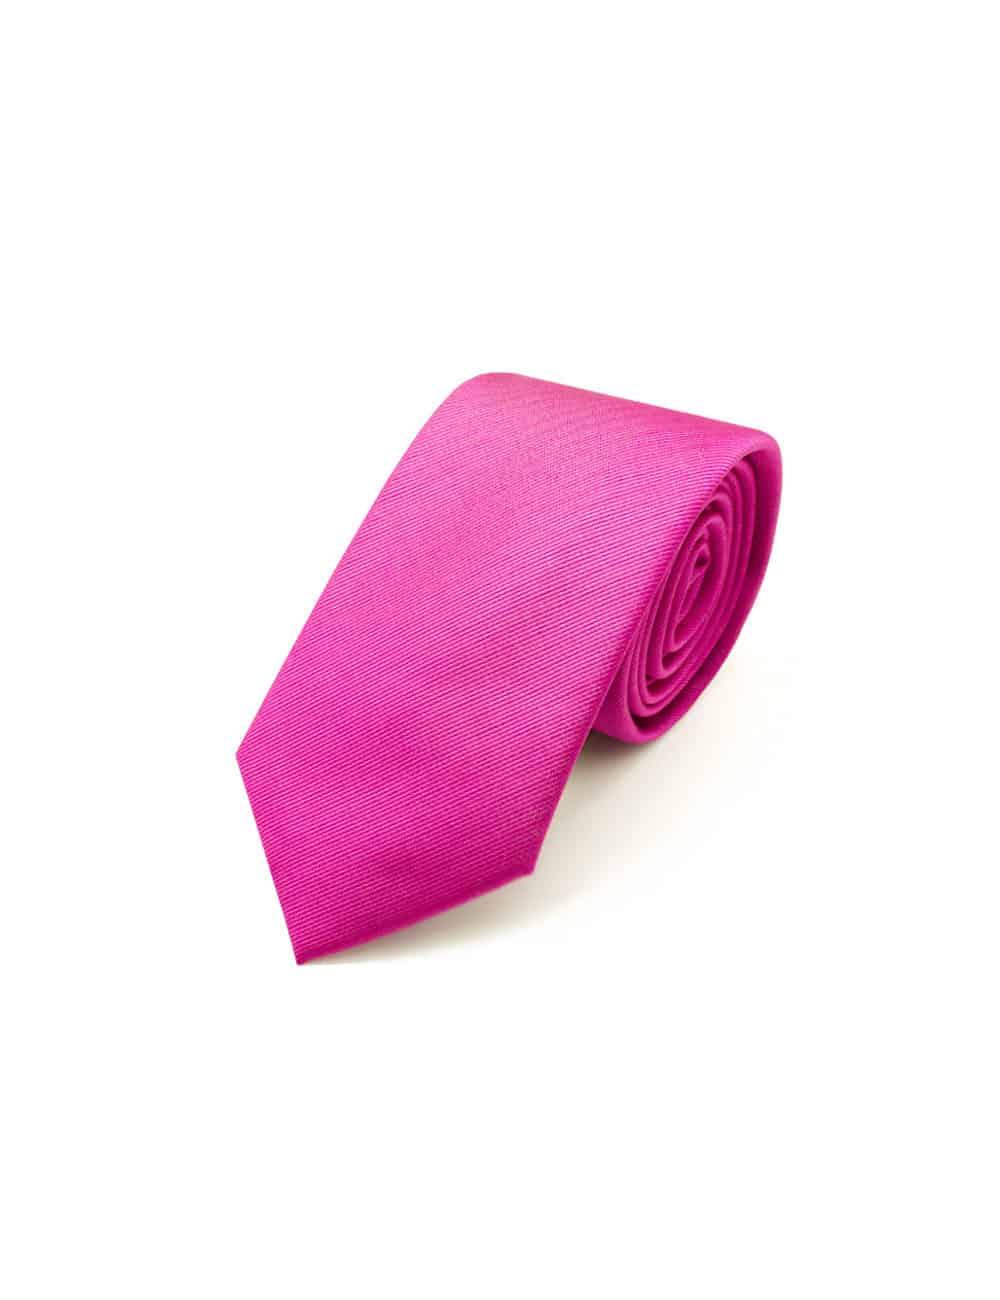 Solid Very Berry Woven Necktie NT7.4